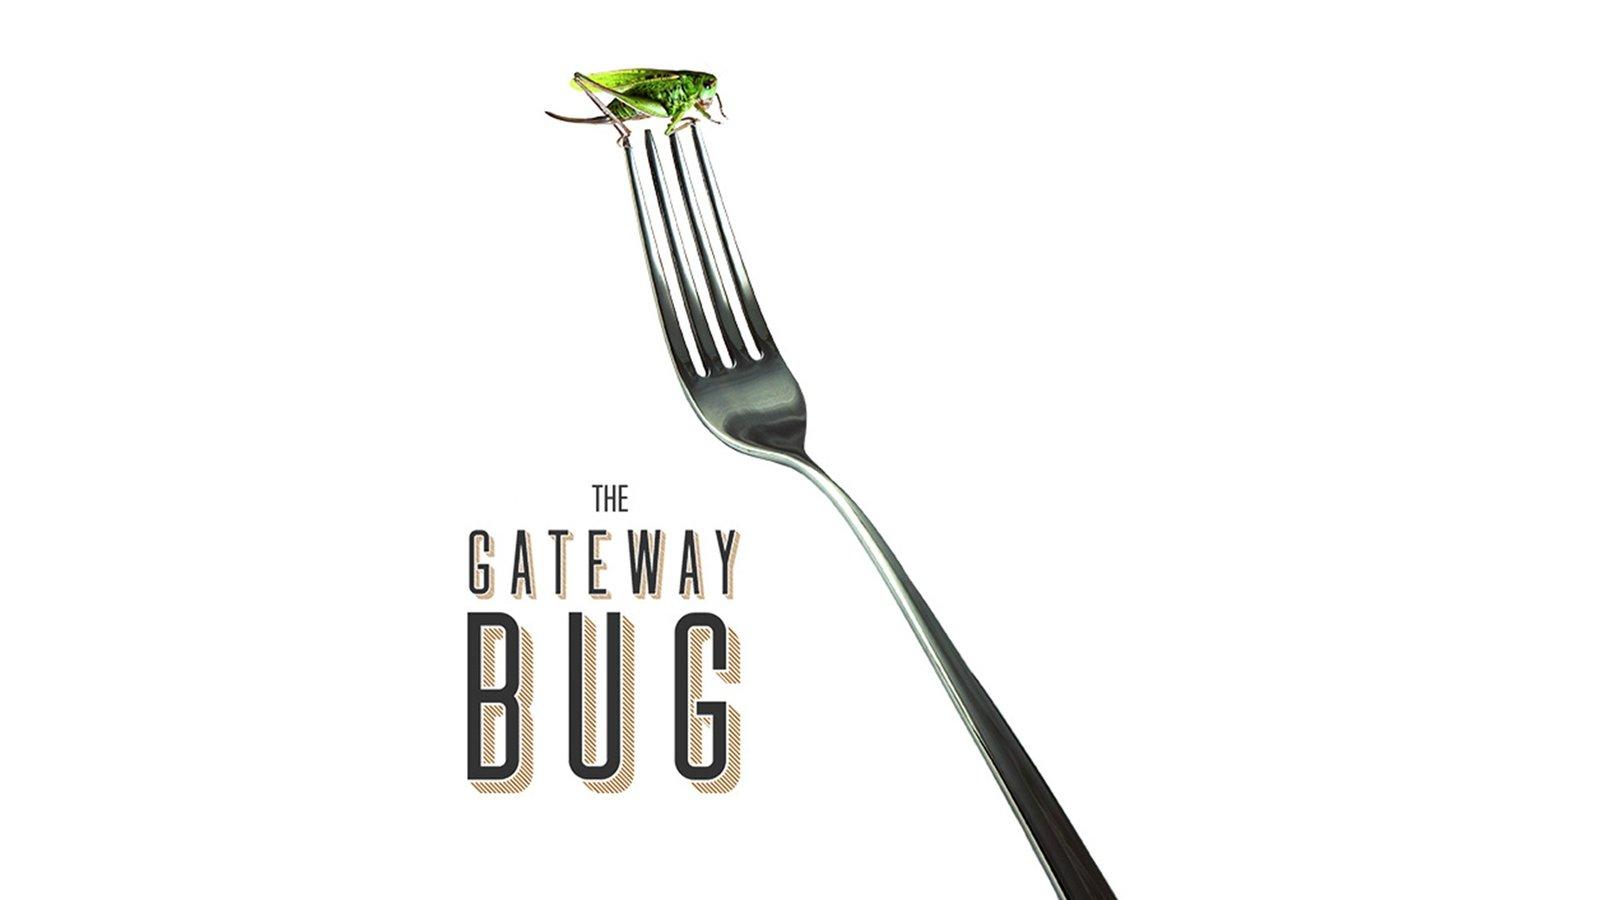 The Gateway Bug - Feeding Humanity in an Uncertian Age